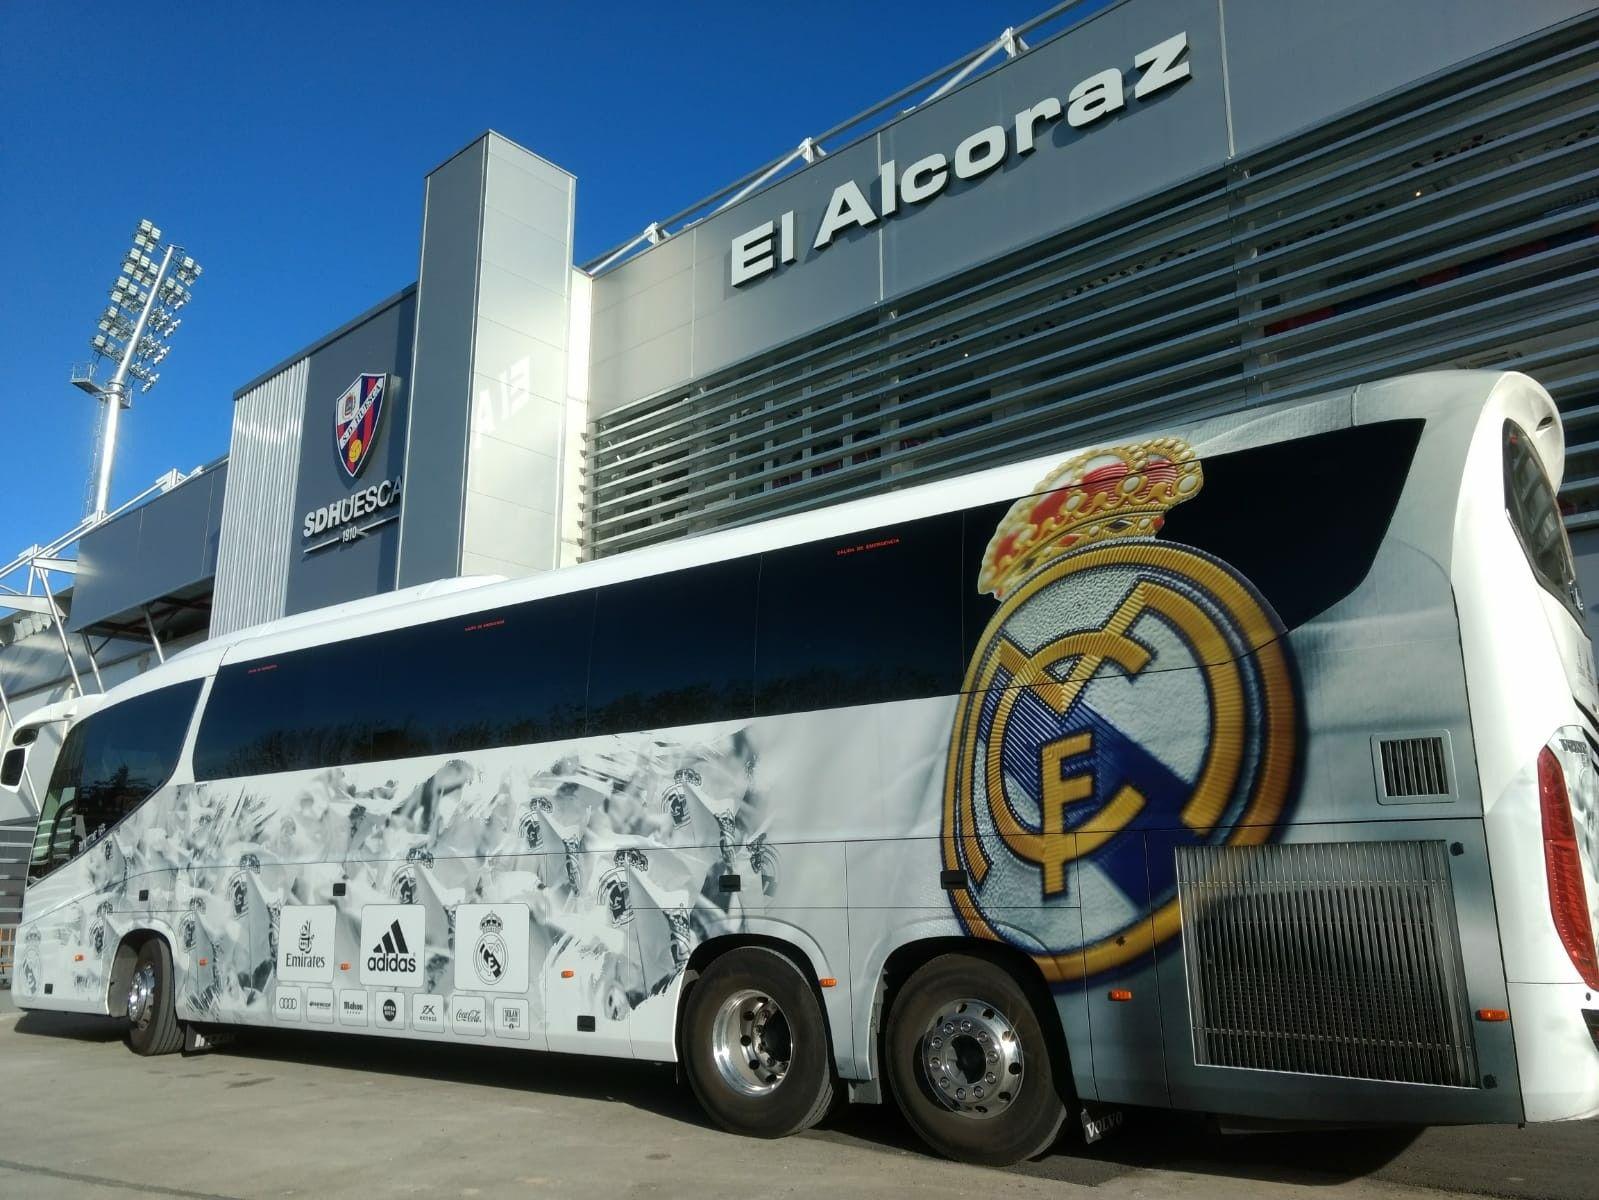 Autobus Del Porno real madrid   autobus, real madrid, bus